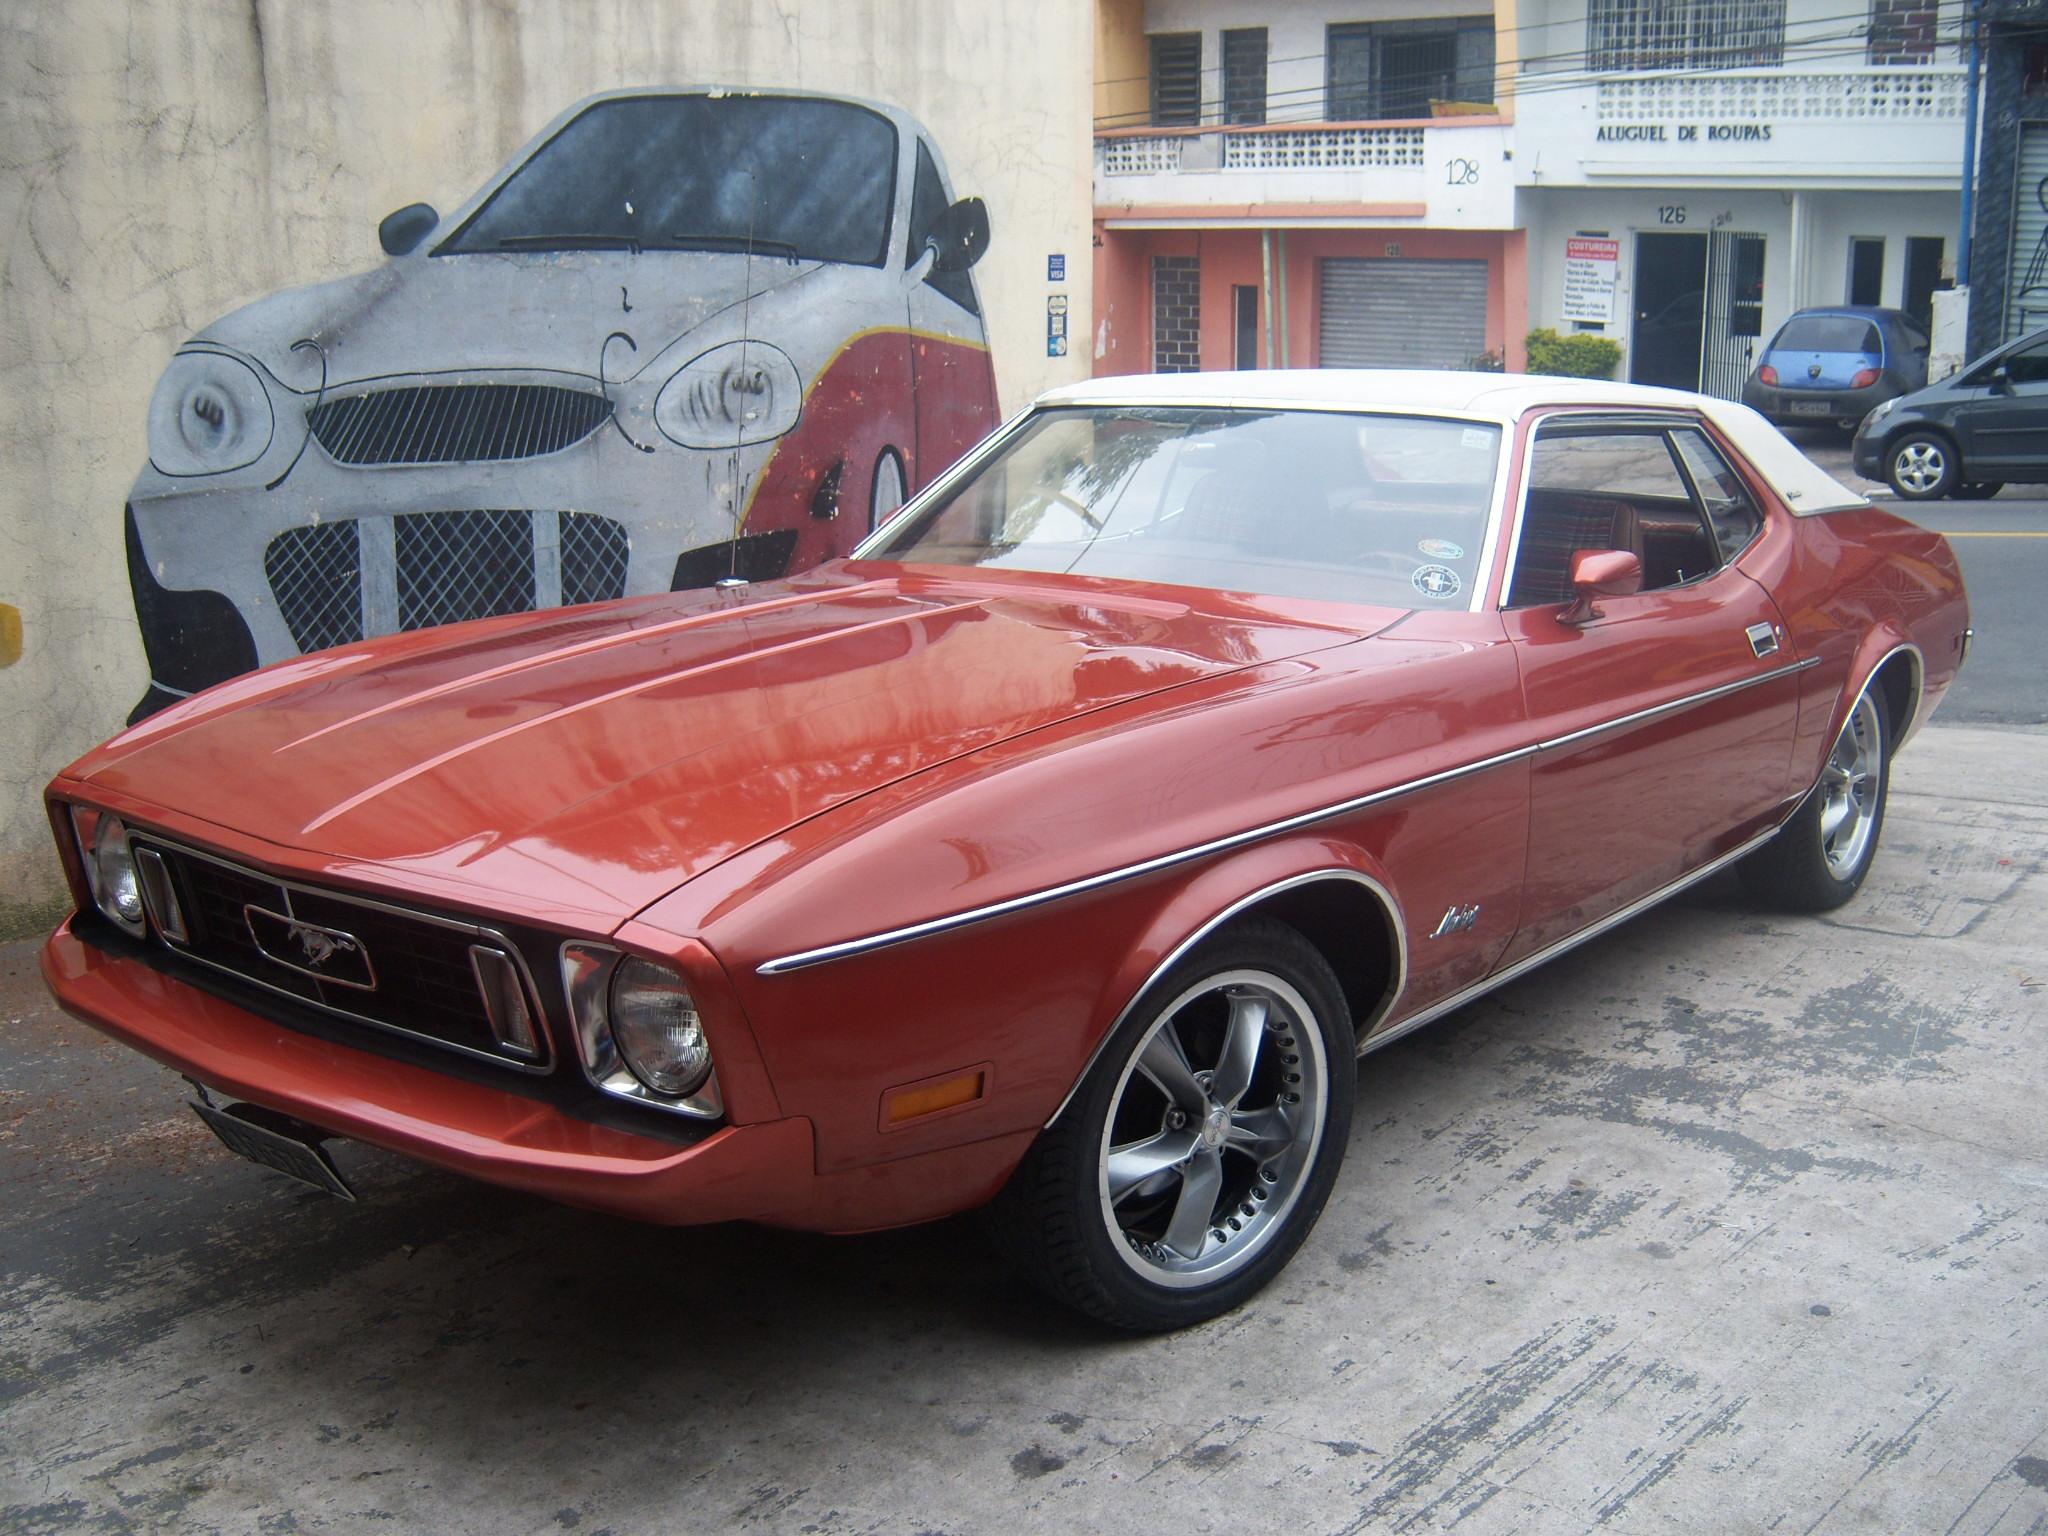 tapecaria-carros-antigos-29.jpg